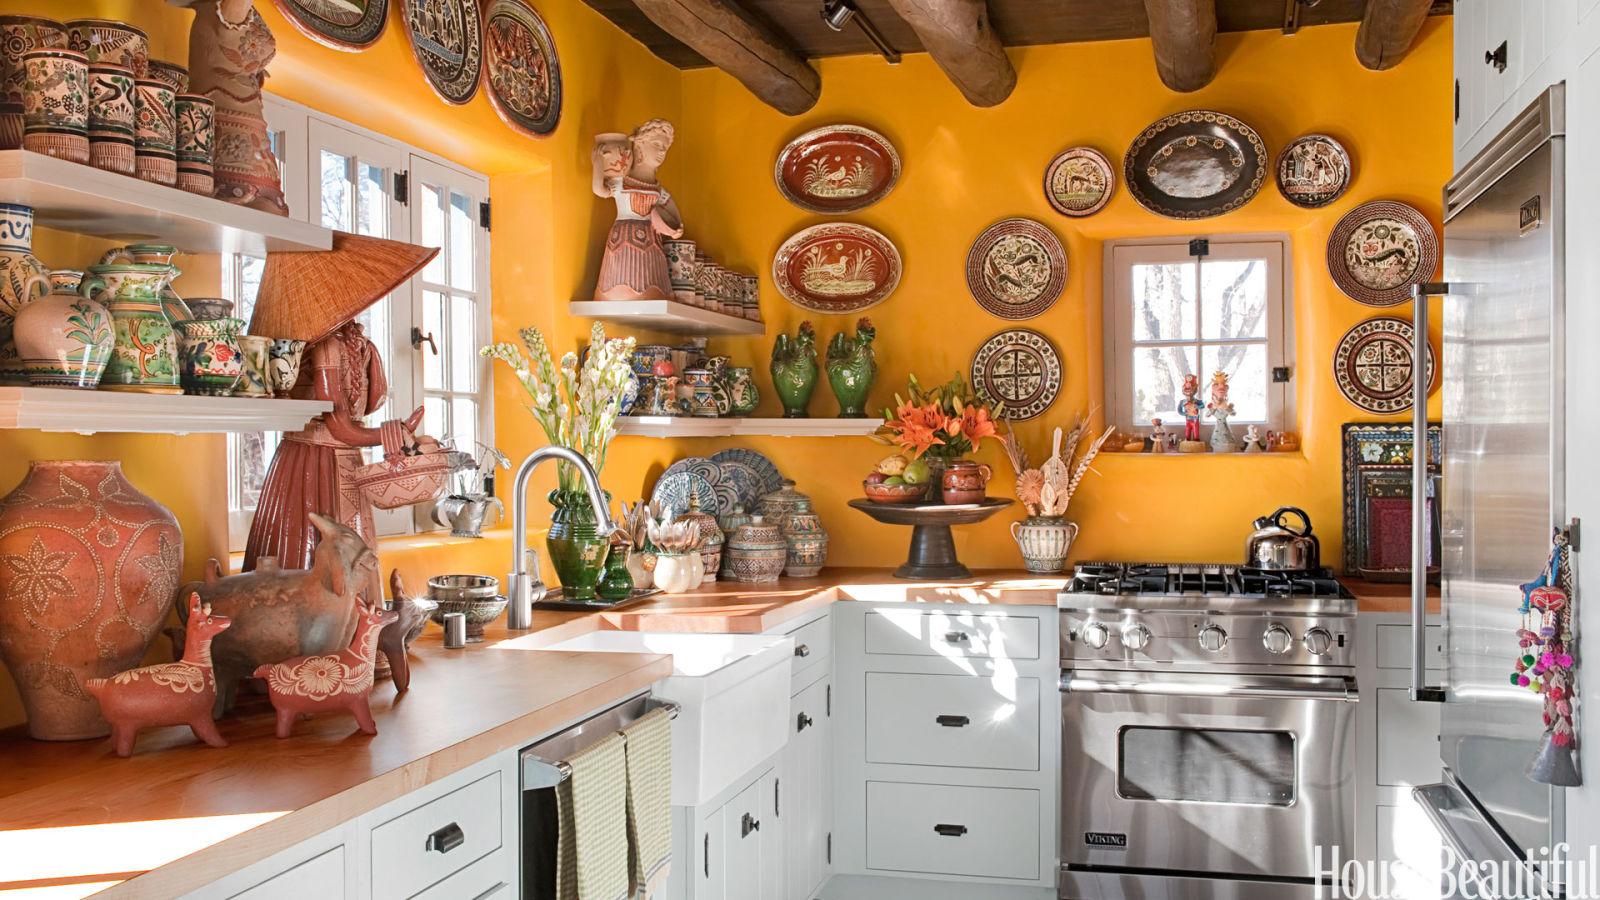 Mexican Themed Kitchen Decor Yellow Kitchen With Santa Fe Style Southwest Kitchen Decor